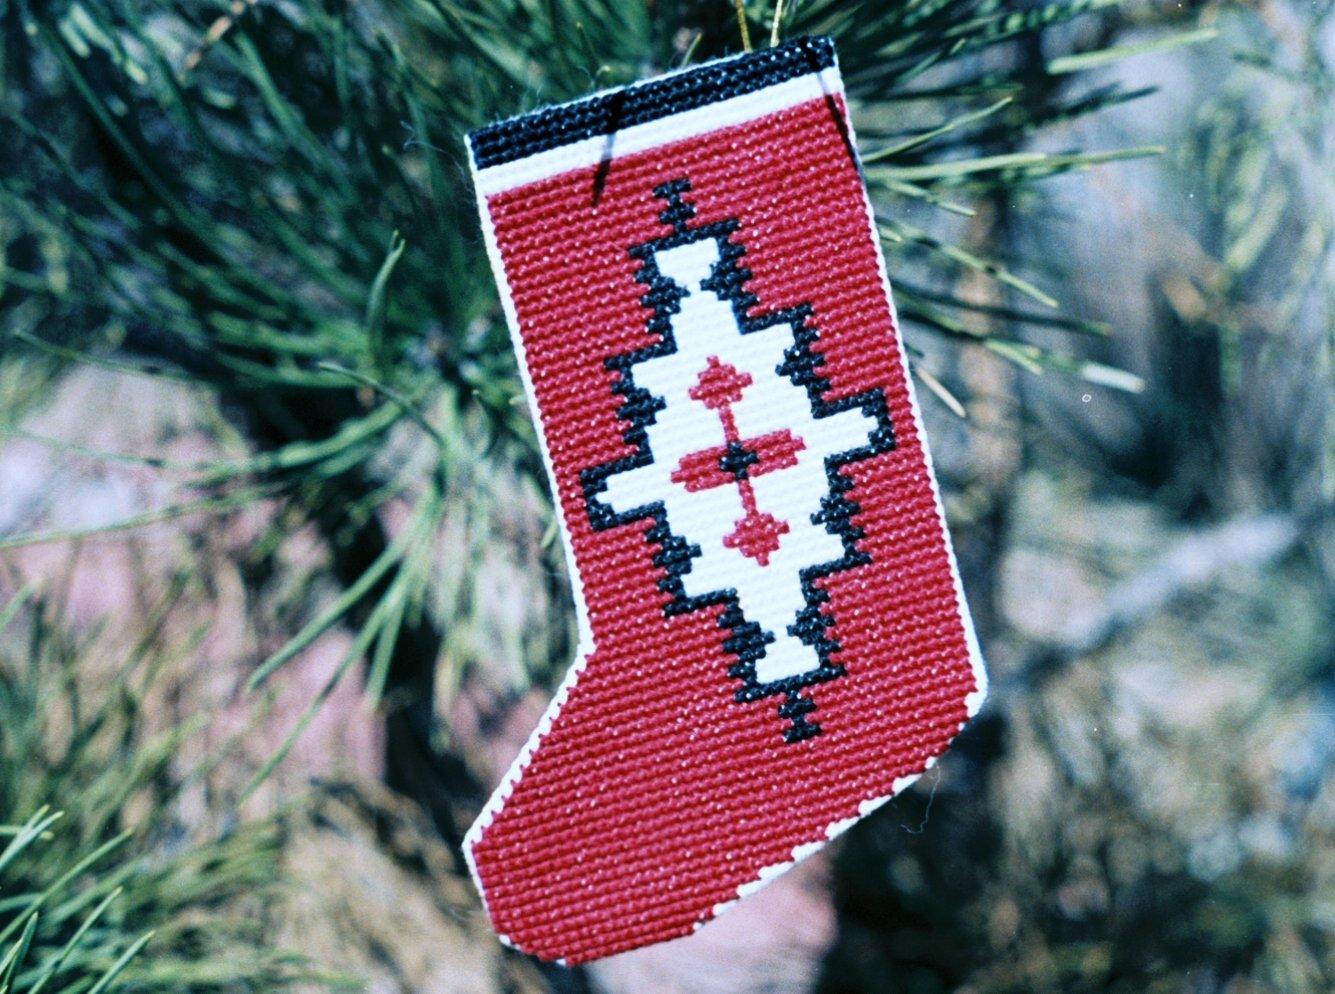 Stocking - Ganado Counted Cross Stitch Kit